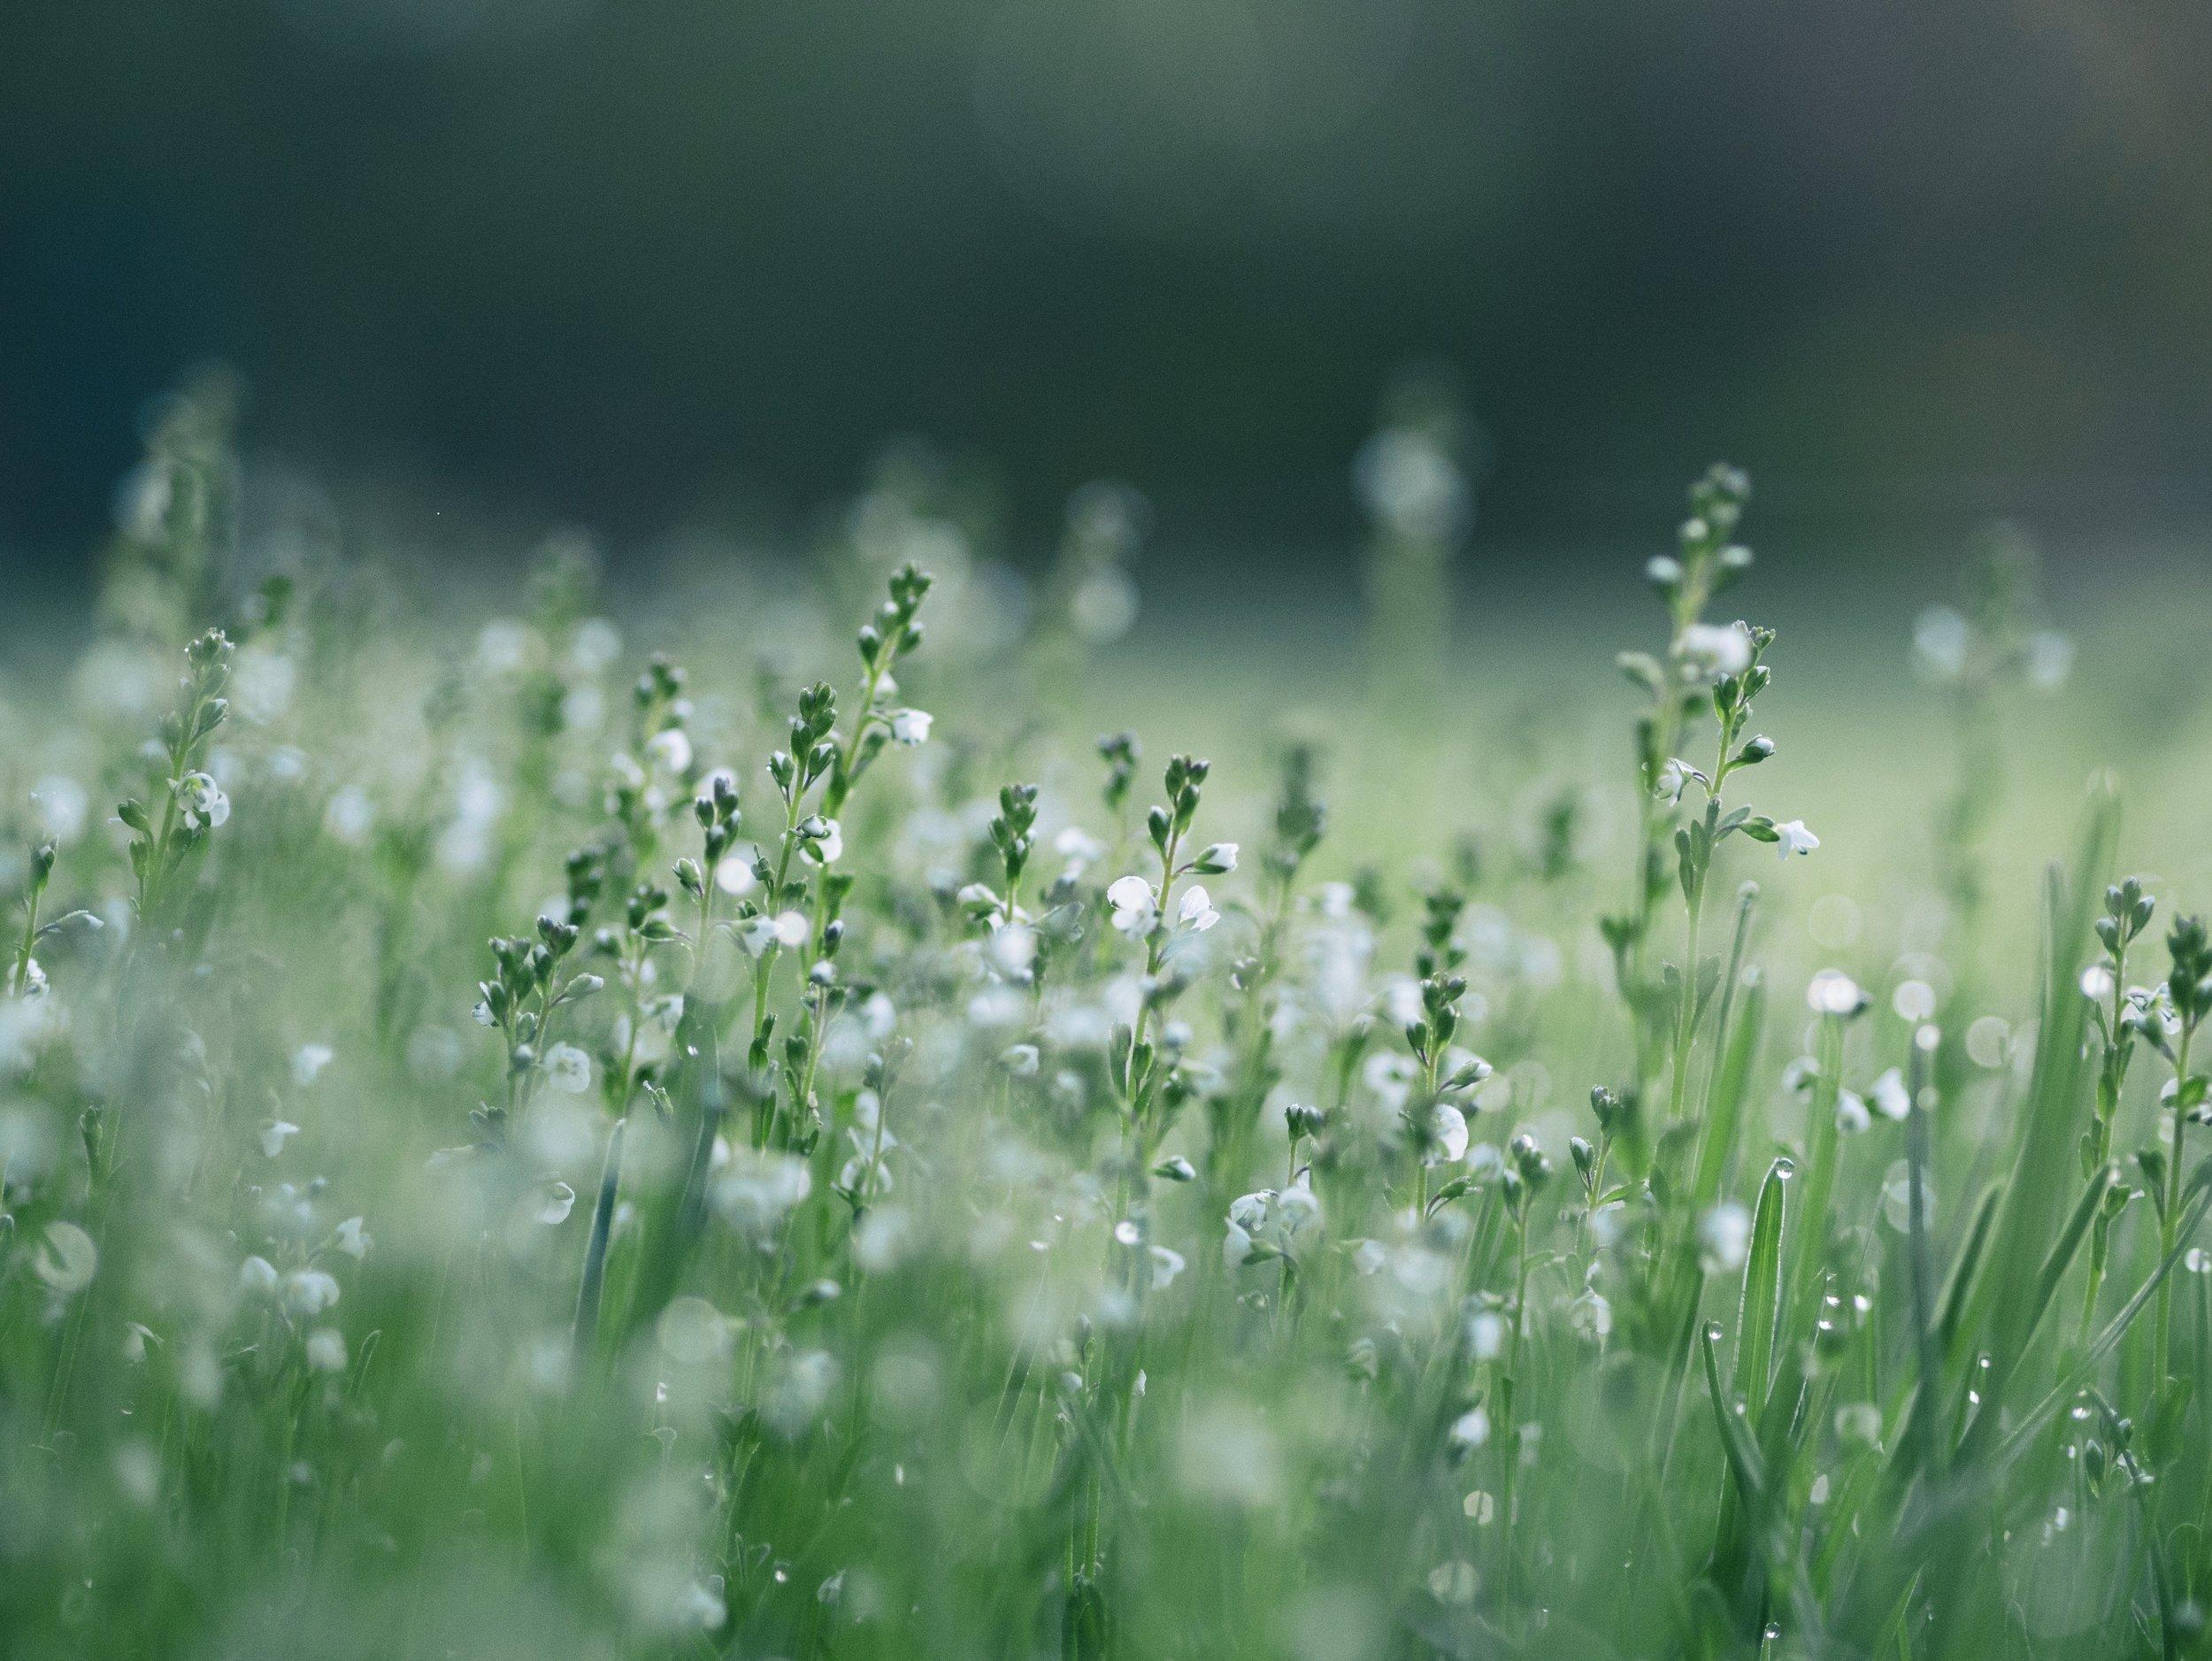 beautiful calming plants in nature